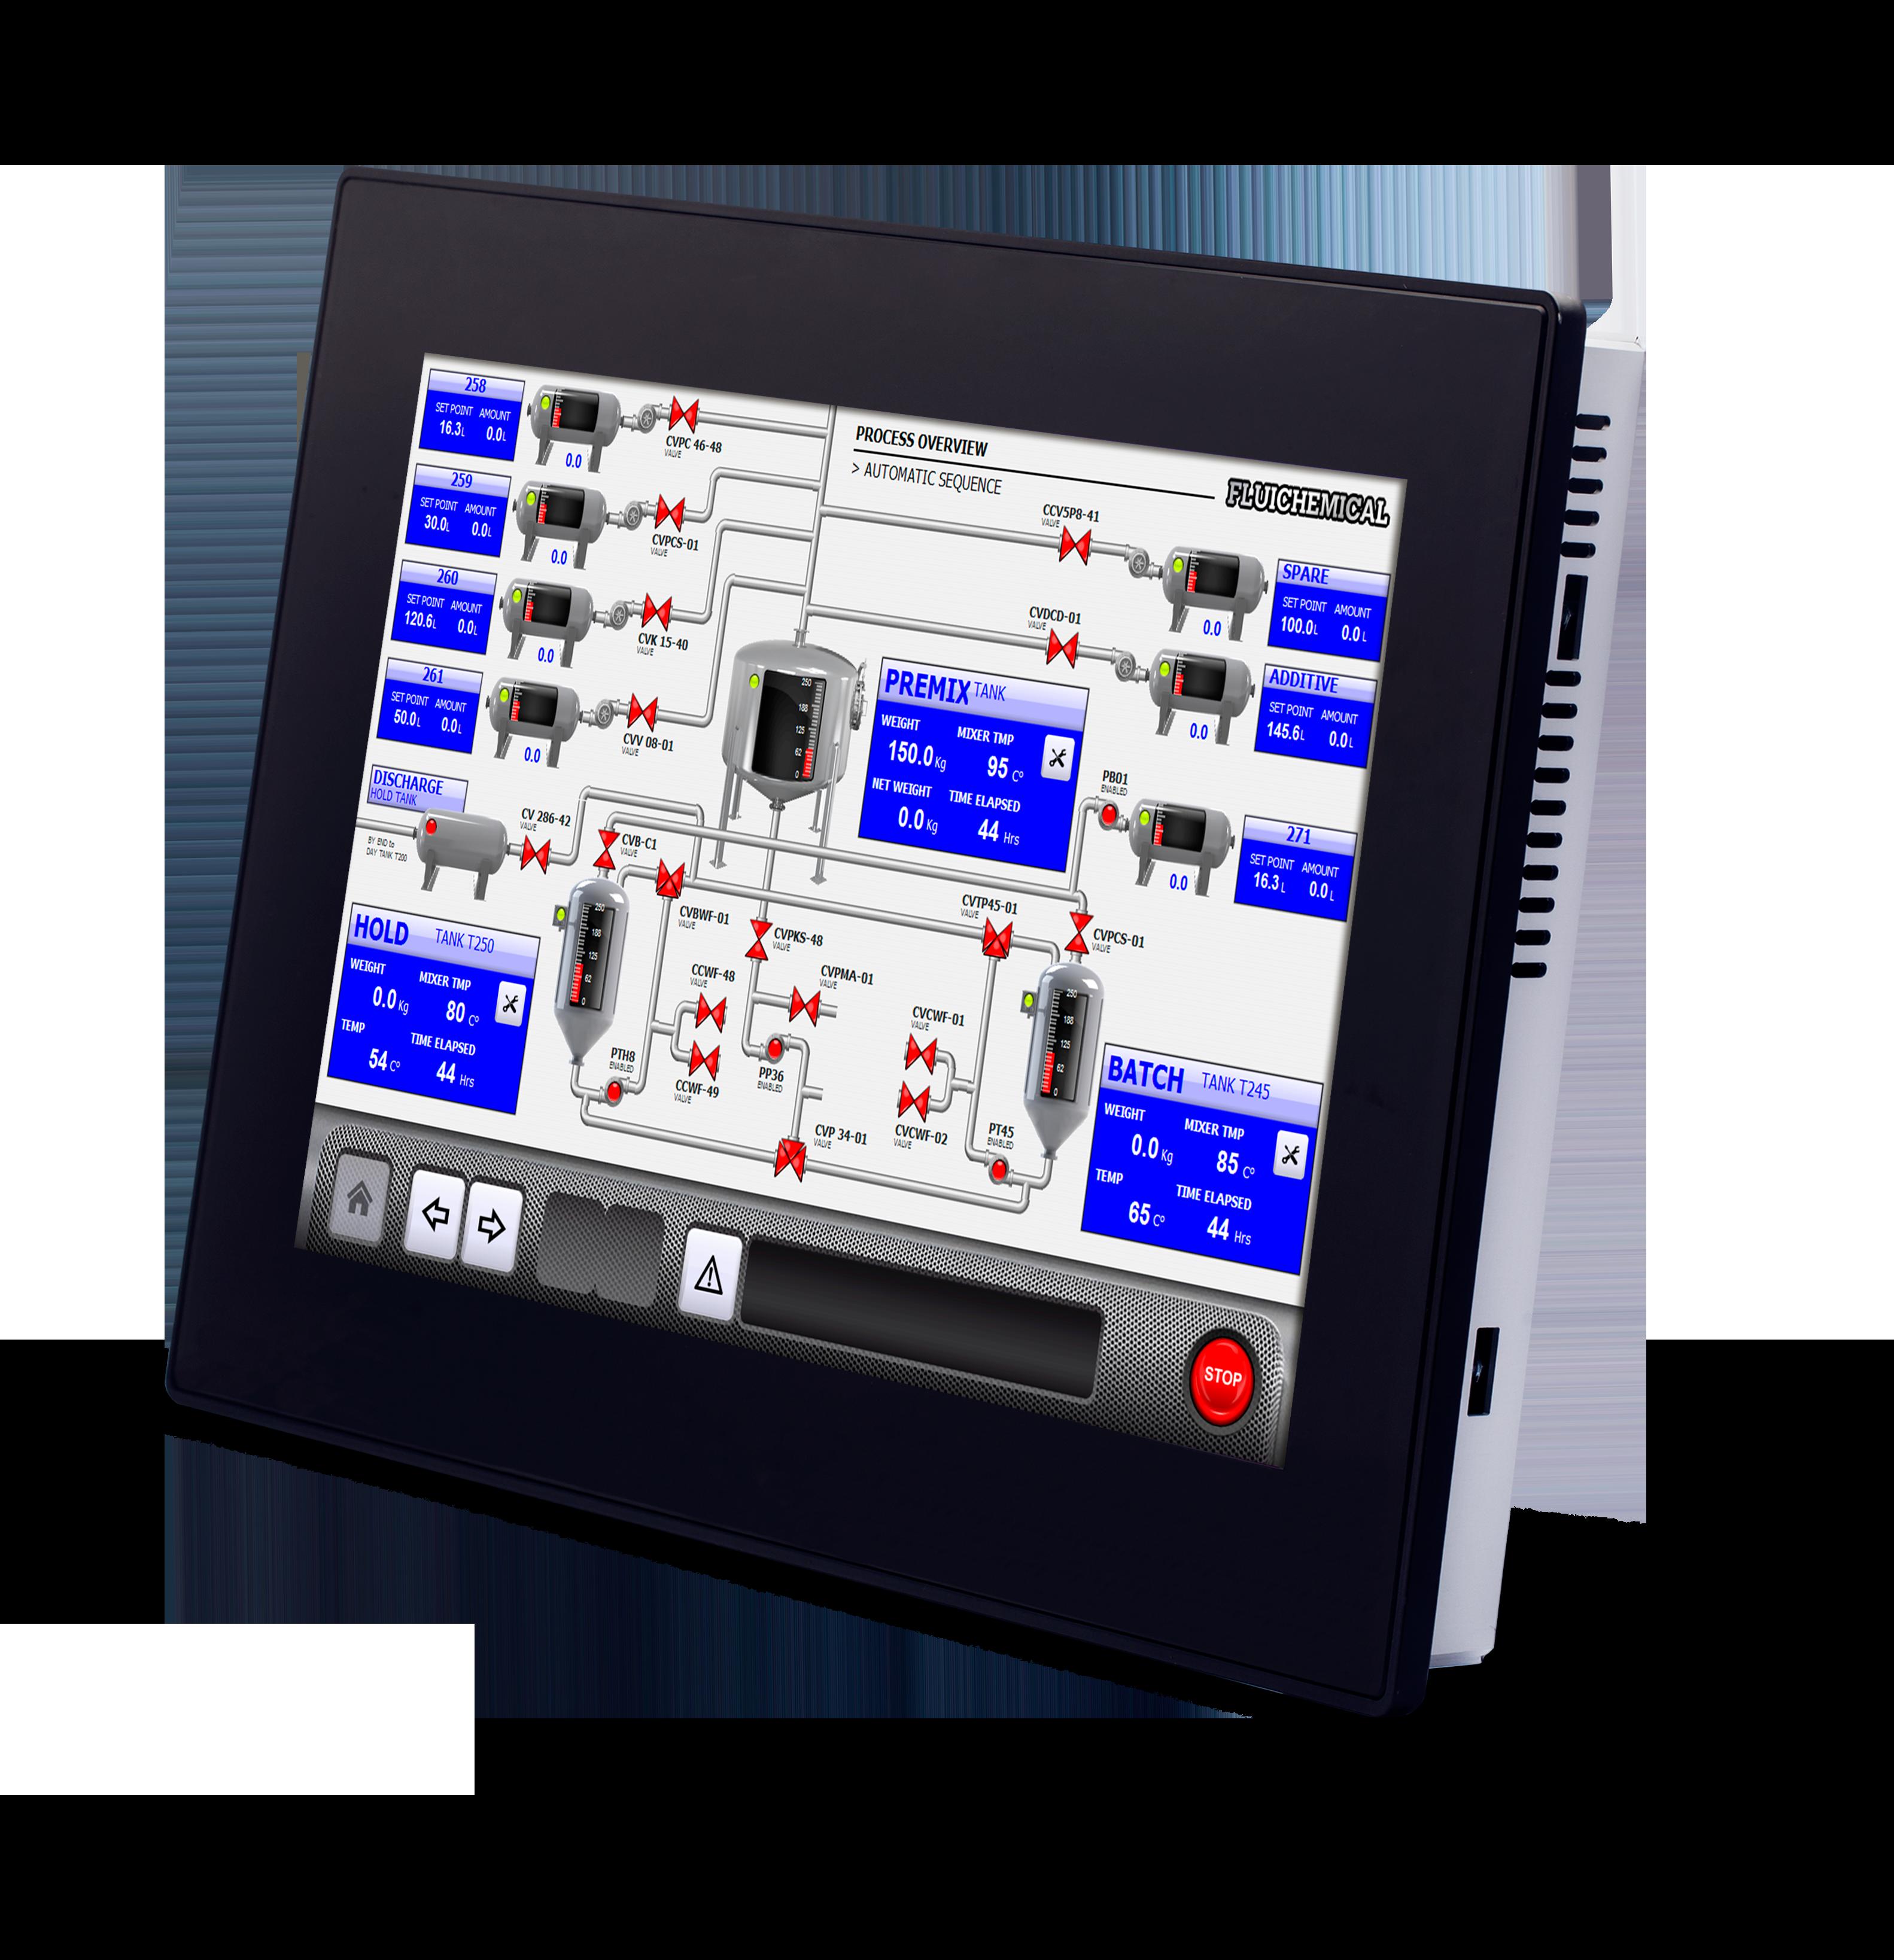 "eX715, Operatørpanel 15,6"" PCT Touch 3xLAN, 1xSerial, 2xUSB"